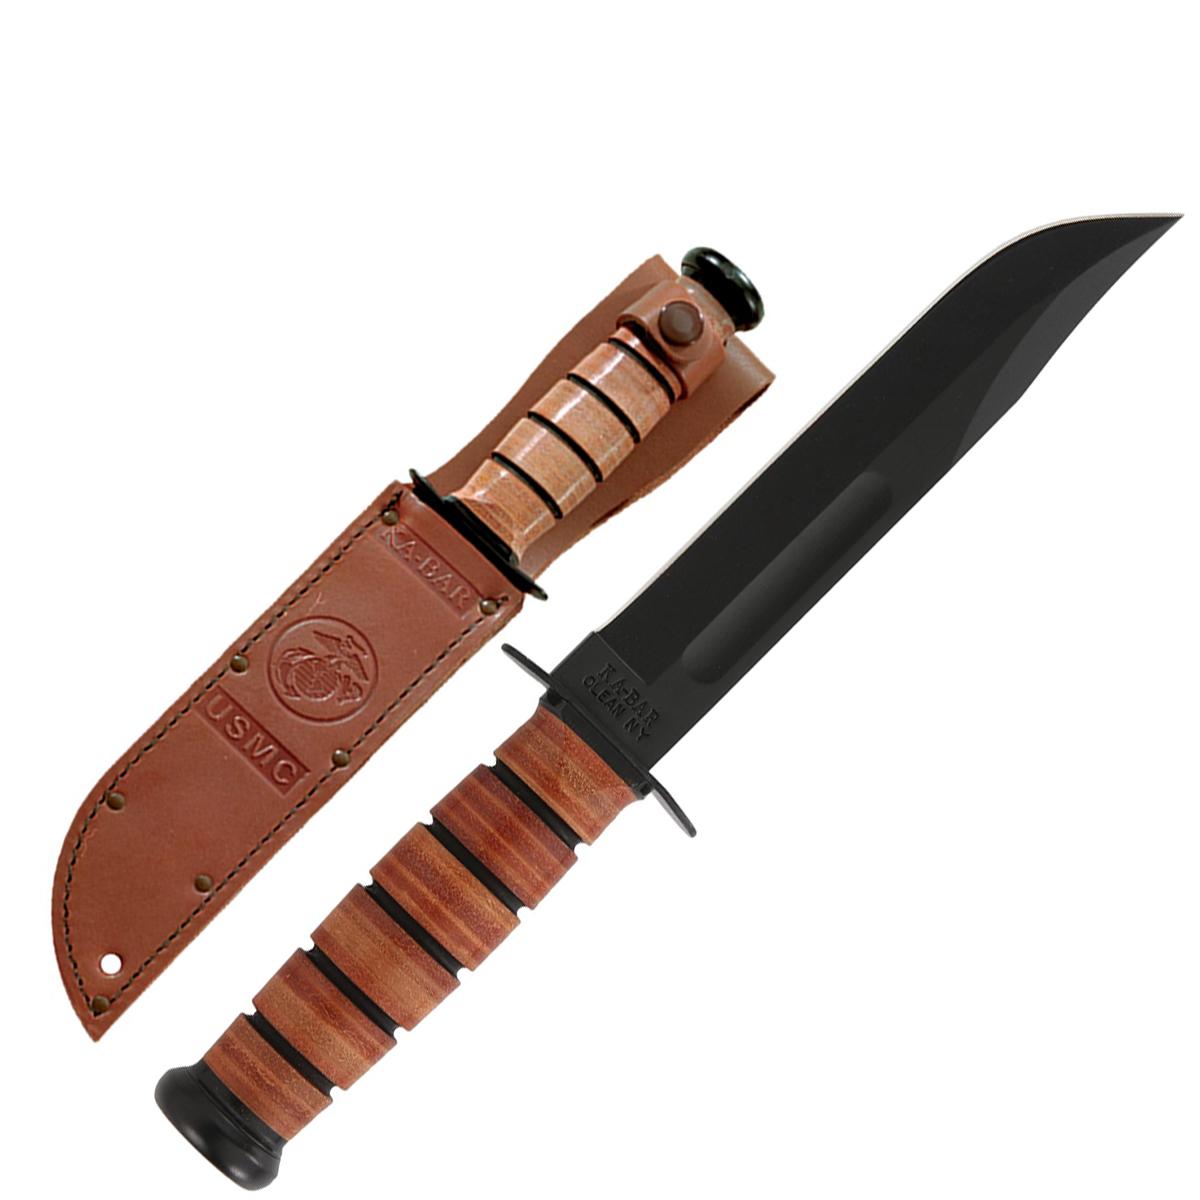 KA-BAR USMC Straight-Edge Fixed-Blade Knife